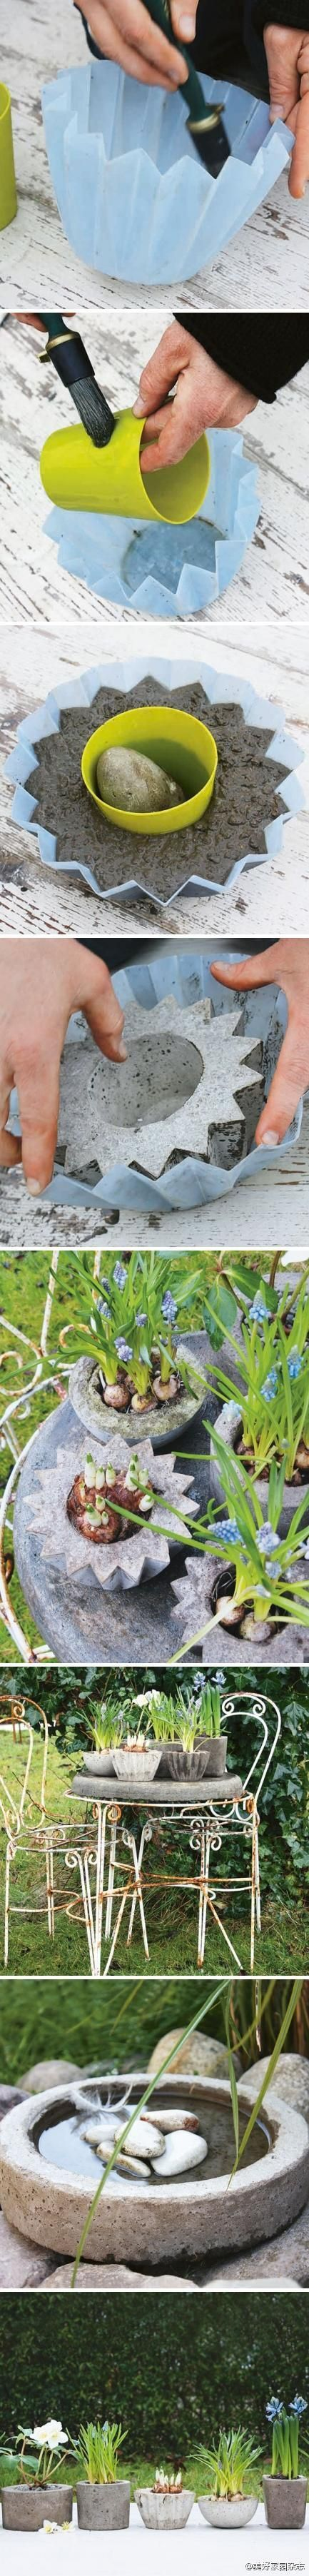 Make Your Own Concrete Planters..